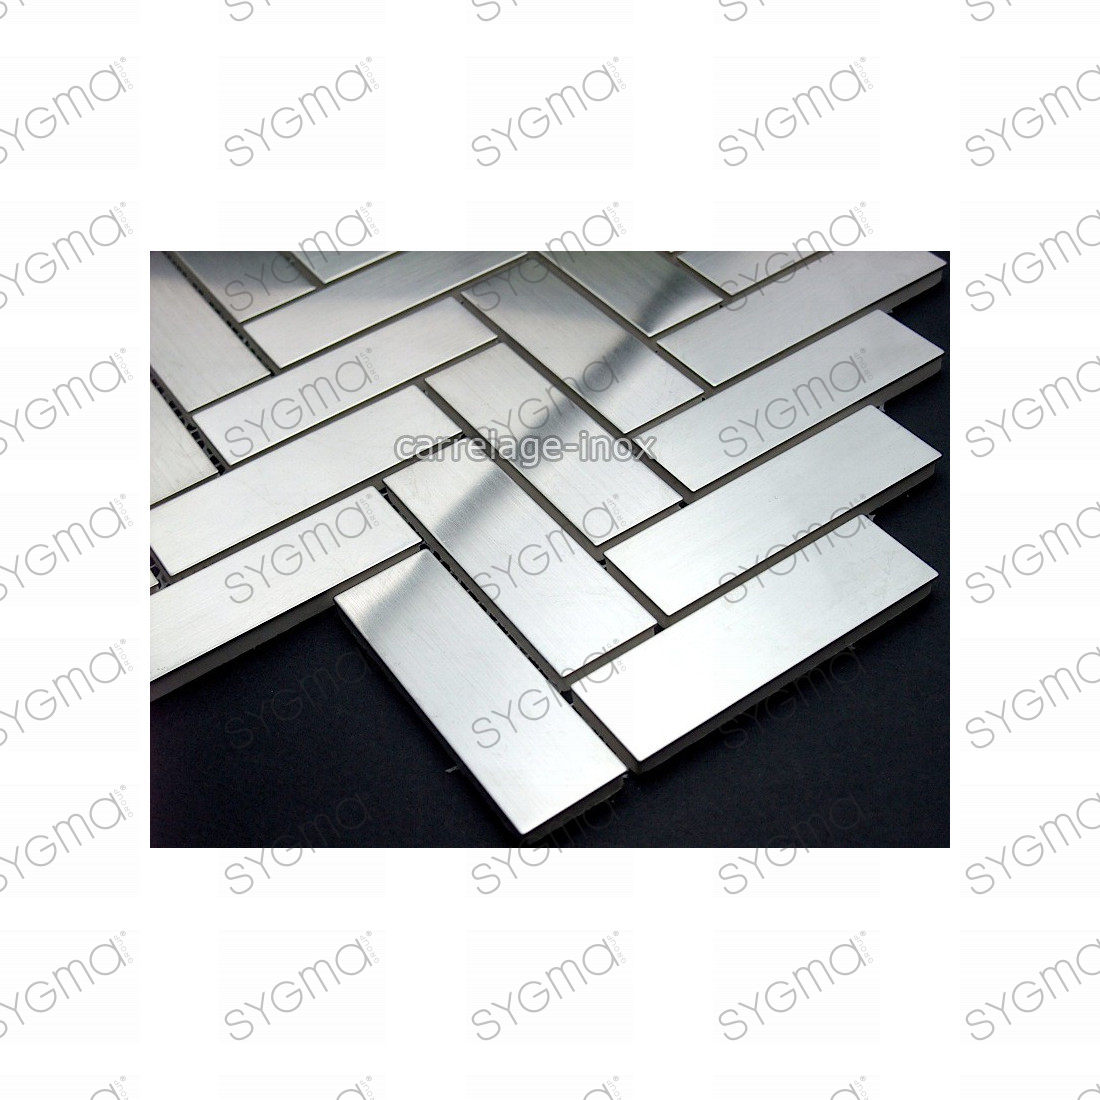 Carrelage mur sol cr dence inox plaque inox cm metro for Plaque inox pour mur